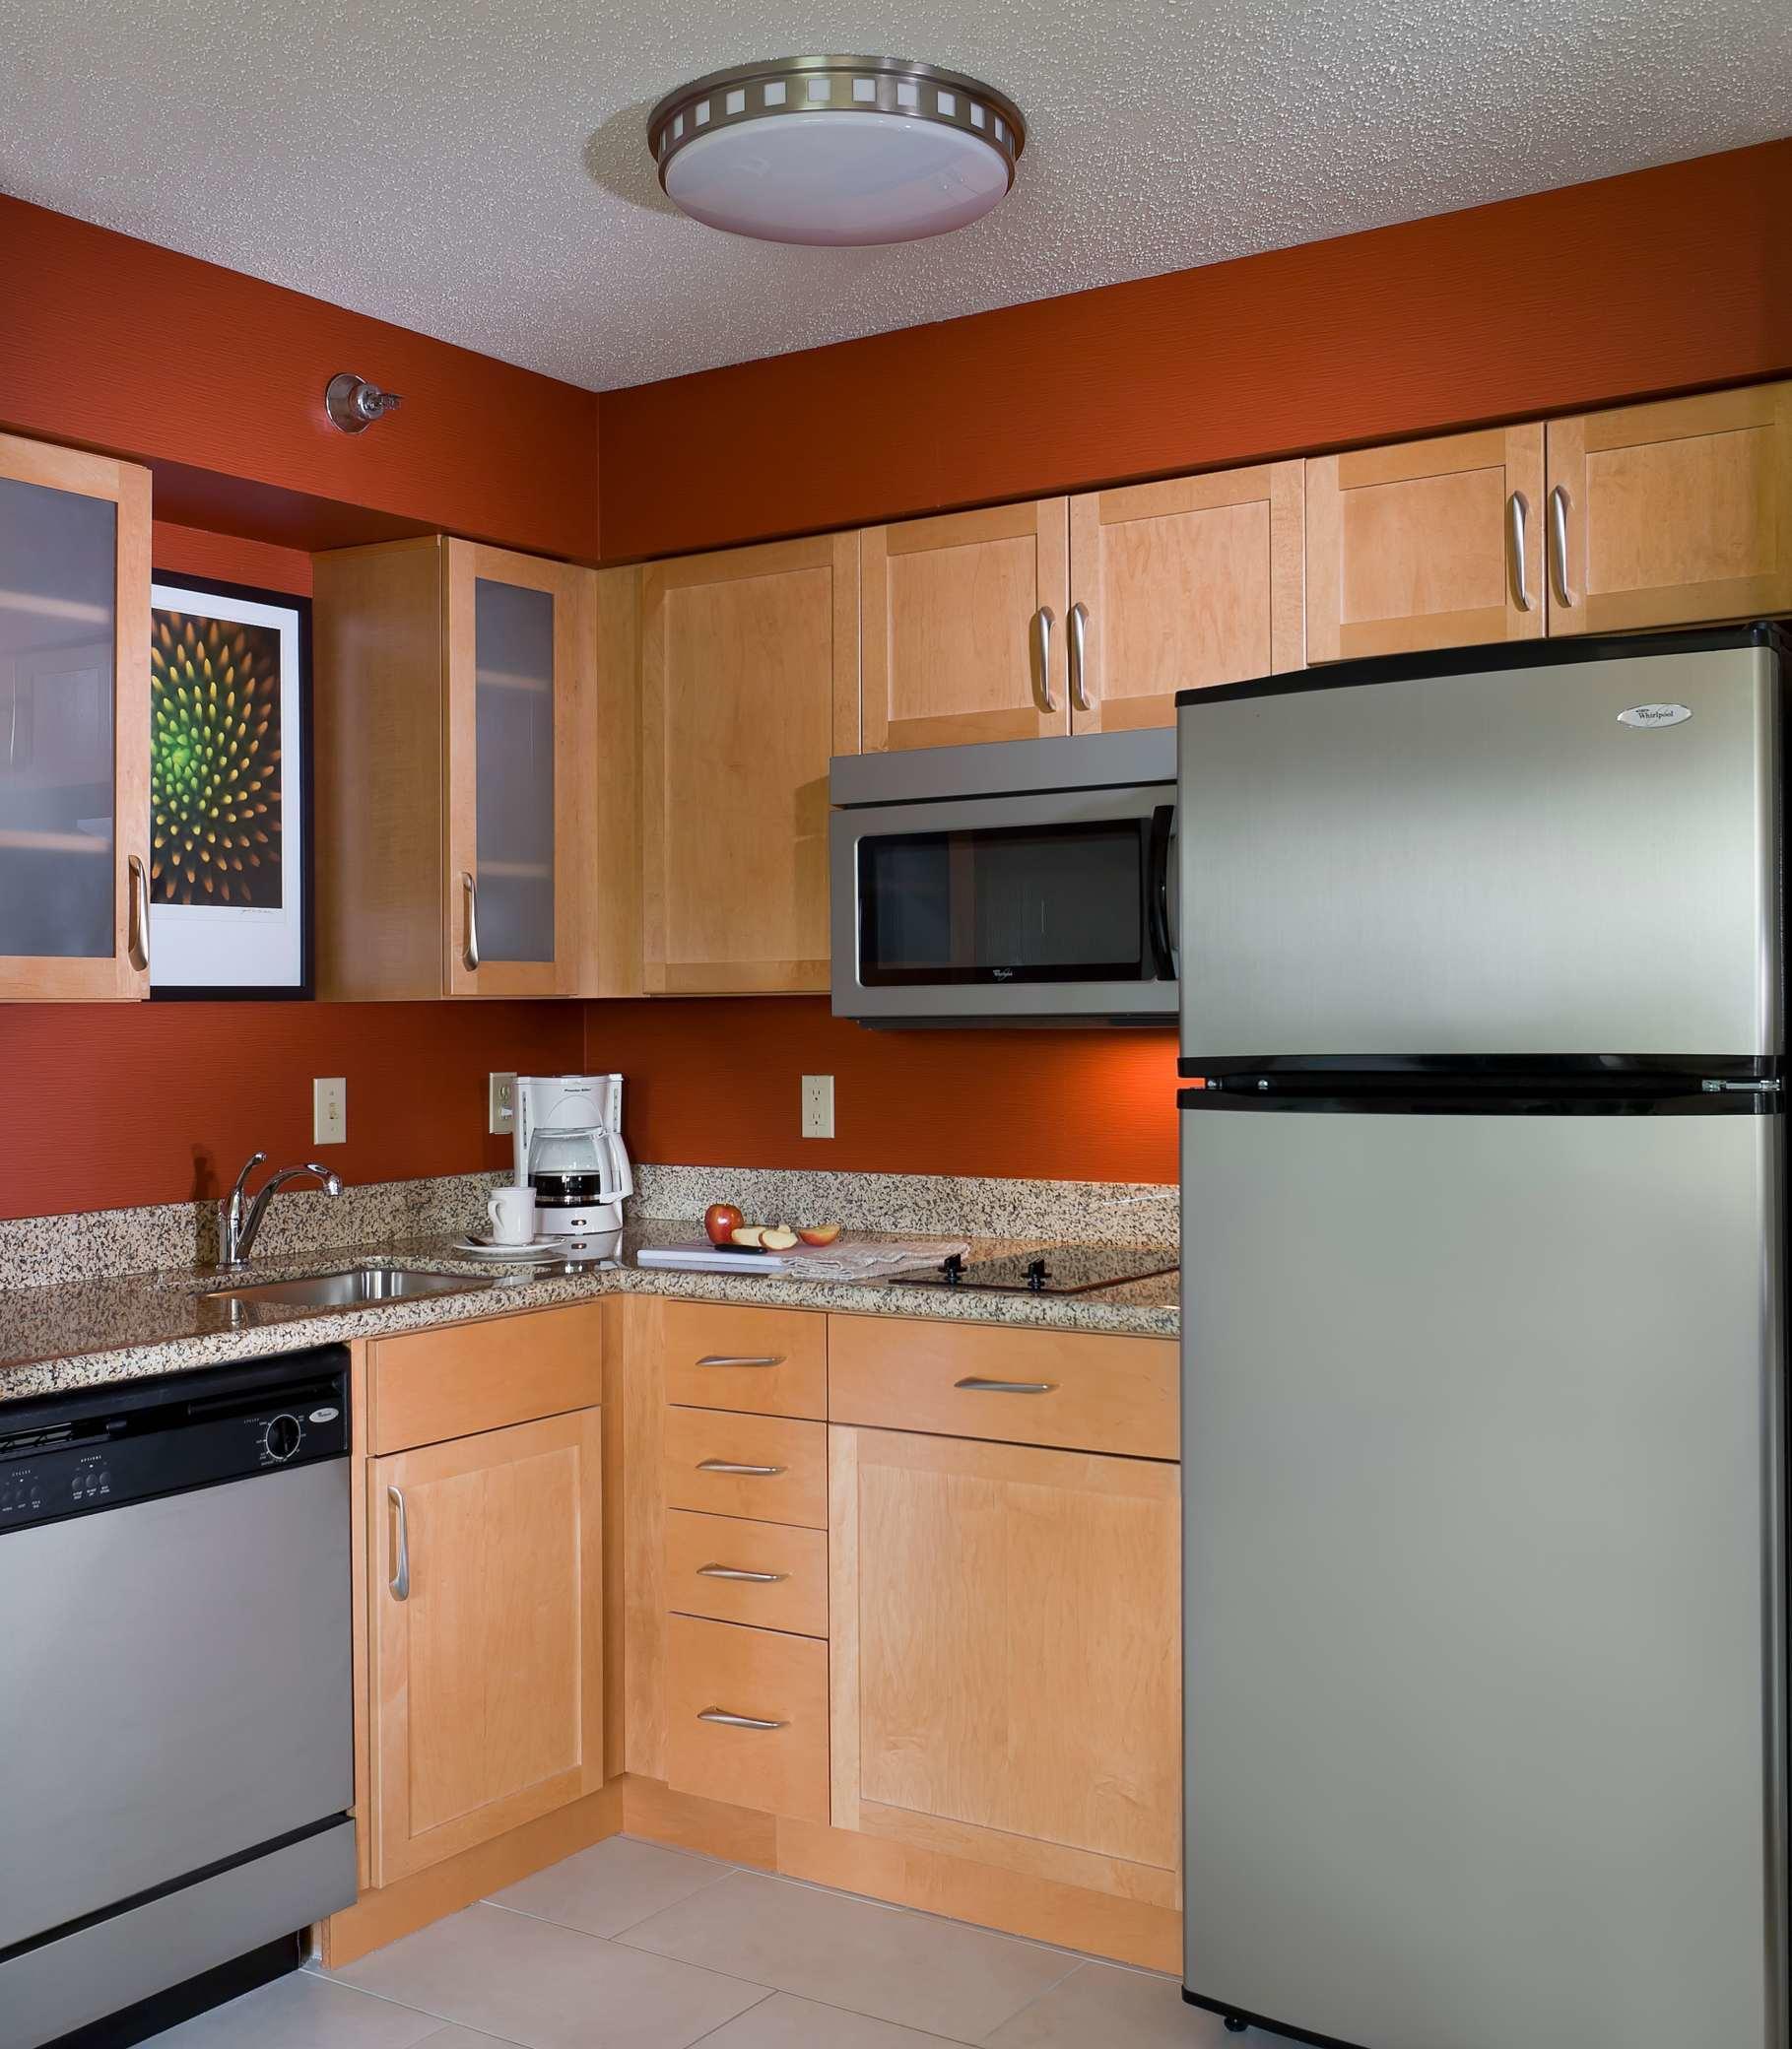 Residence Inn by Marriott Cedar Rapids image 6